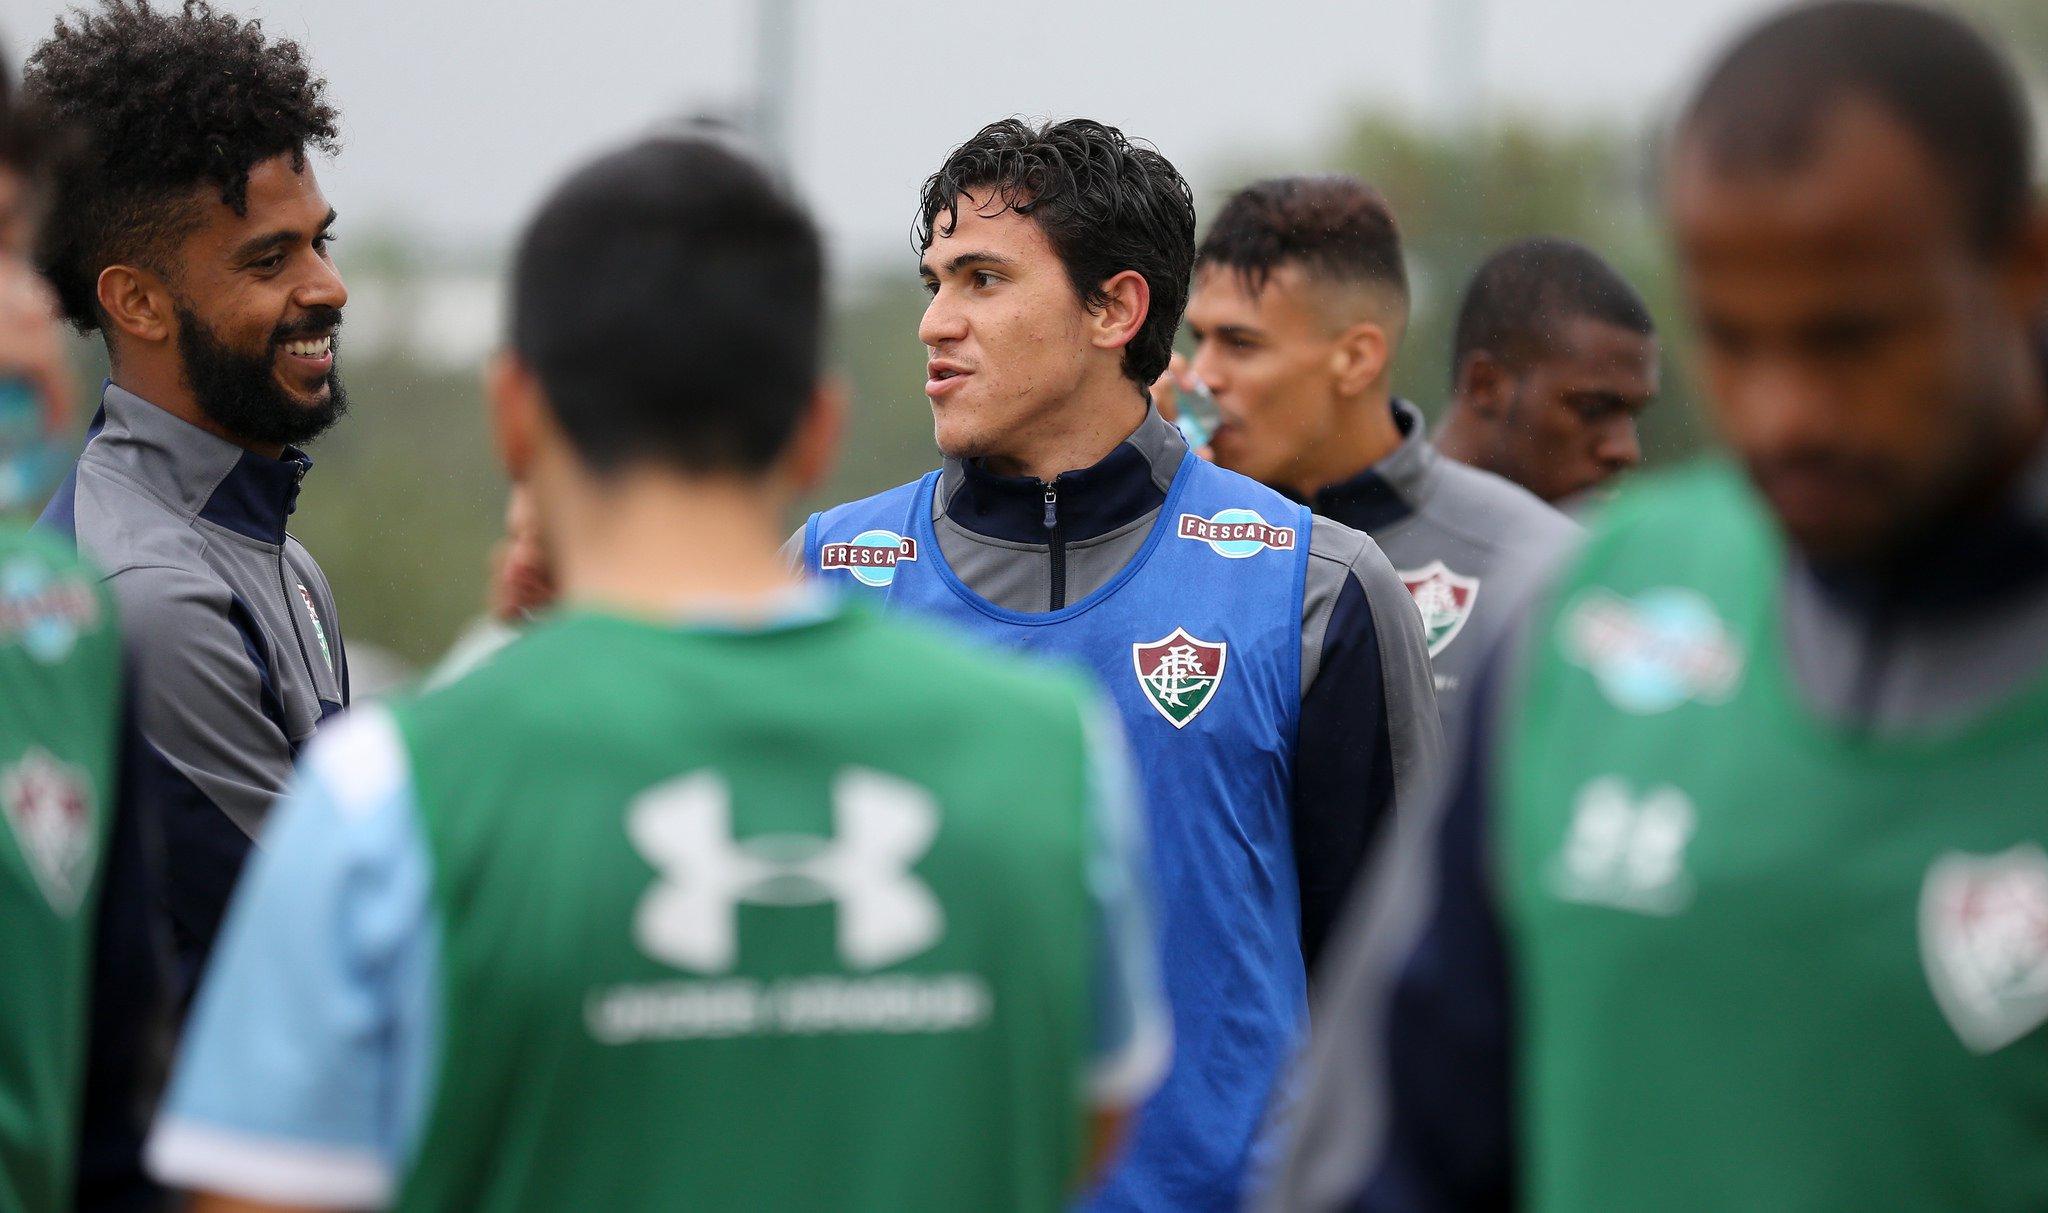 Vasco e Fluminense se enfrentam logo após a Copa do Mundo